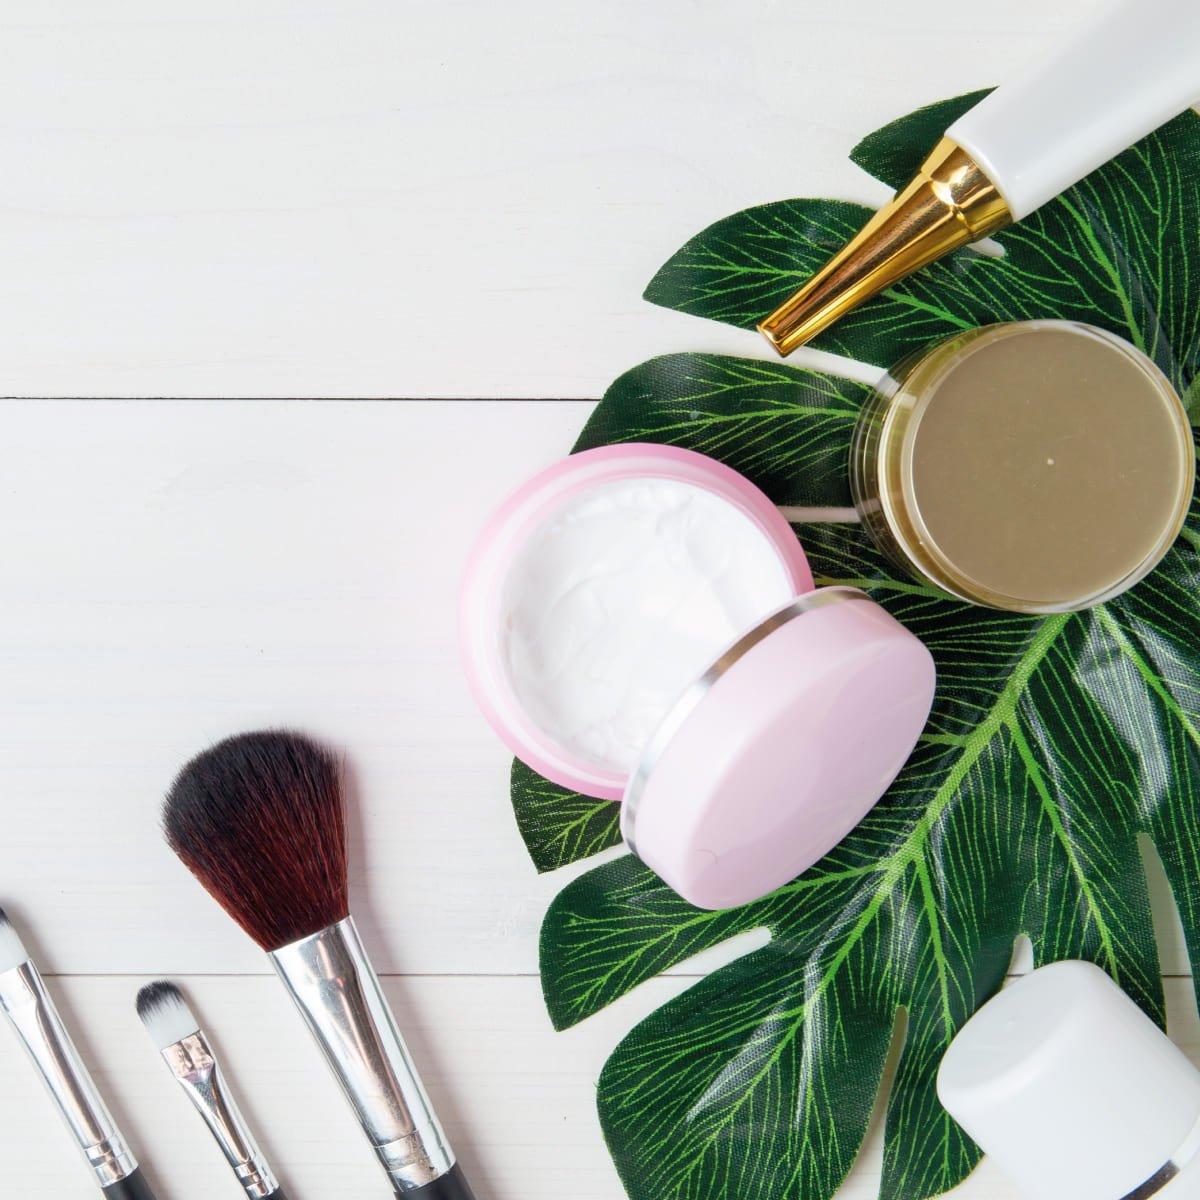 Organic Makeup from INika and Dr Hauschka